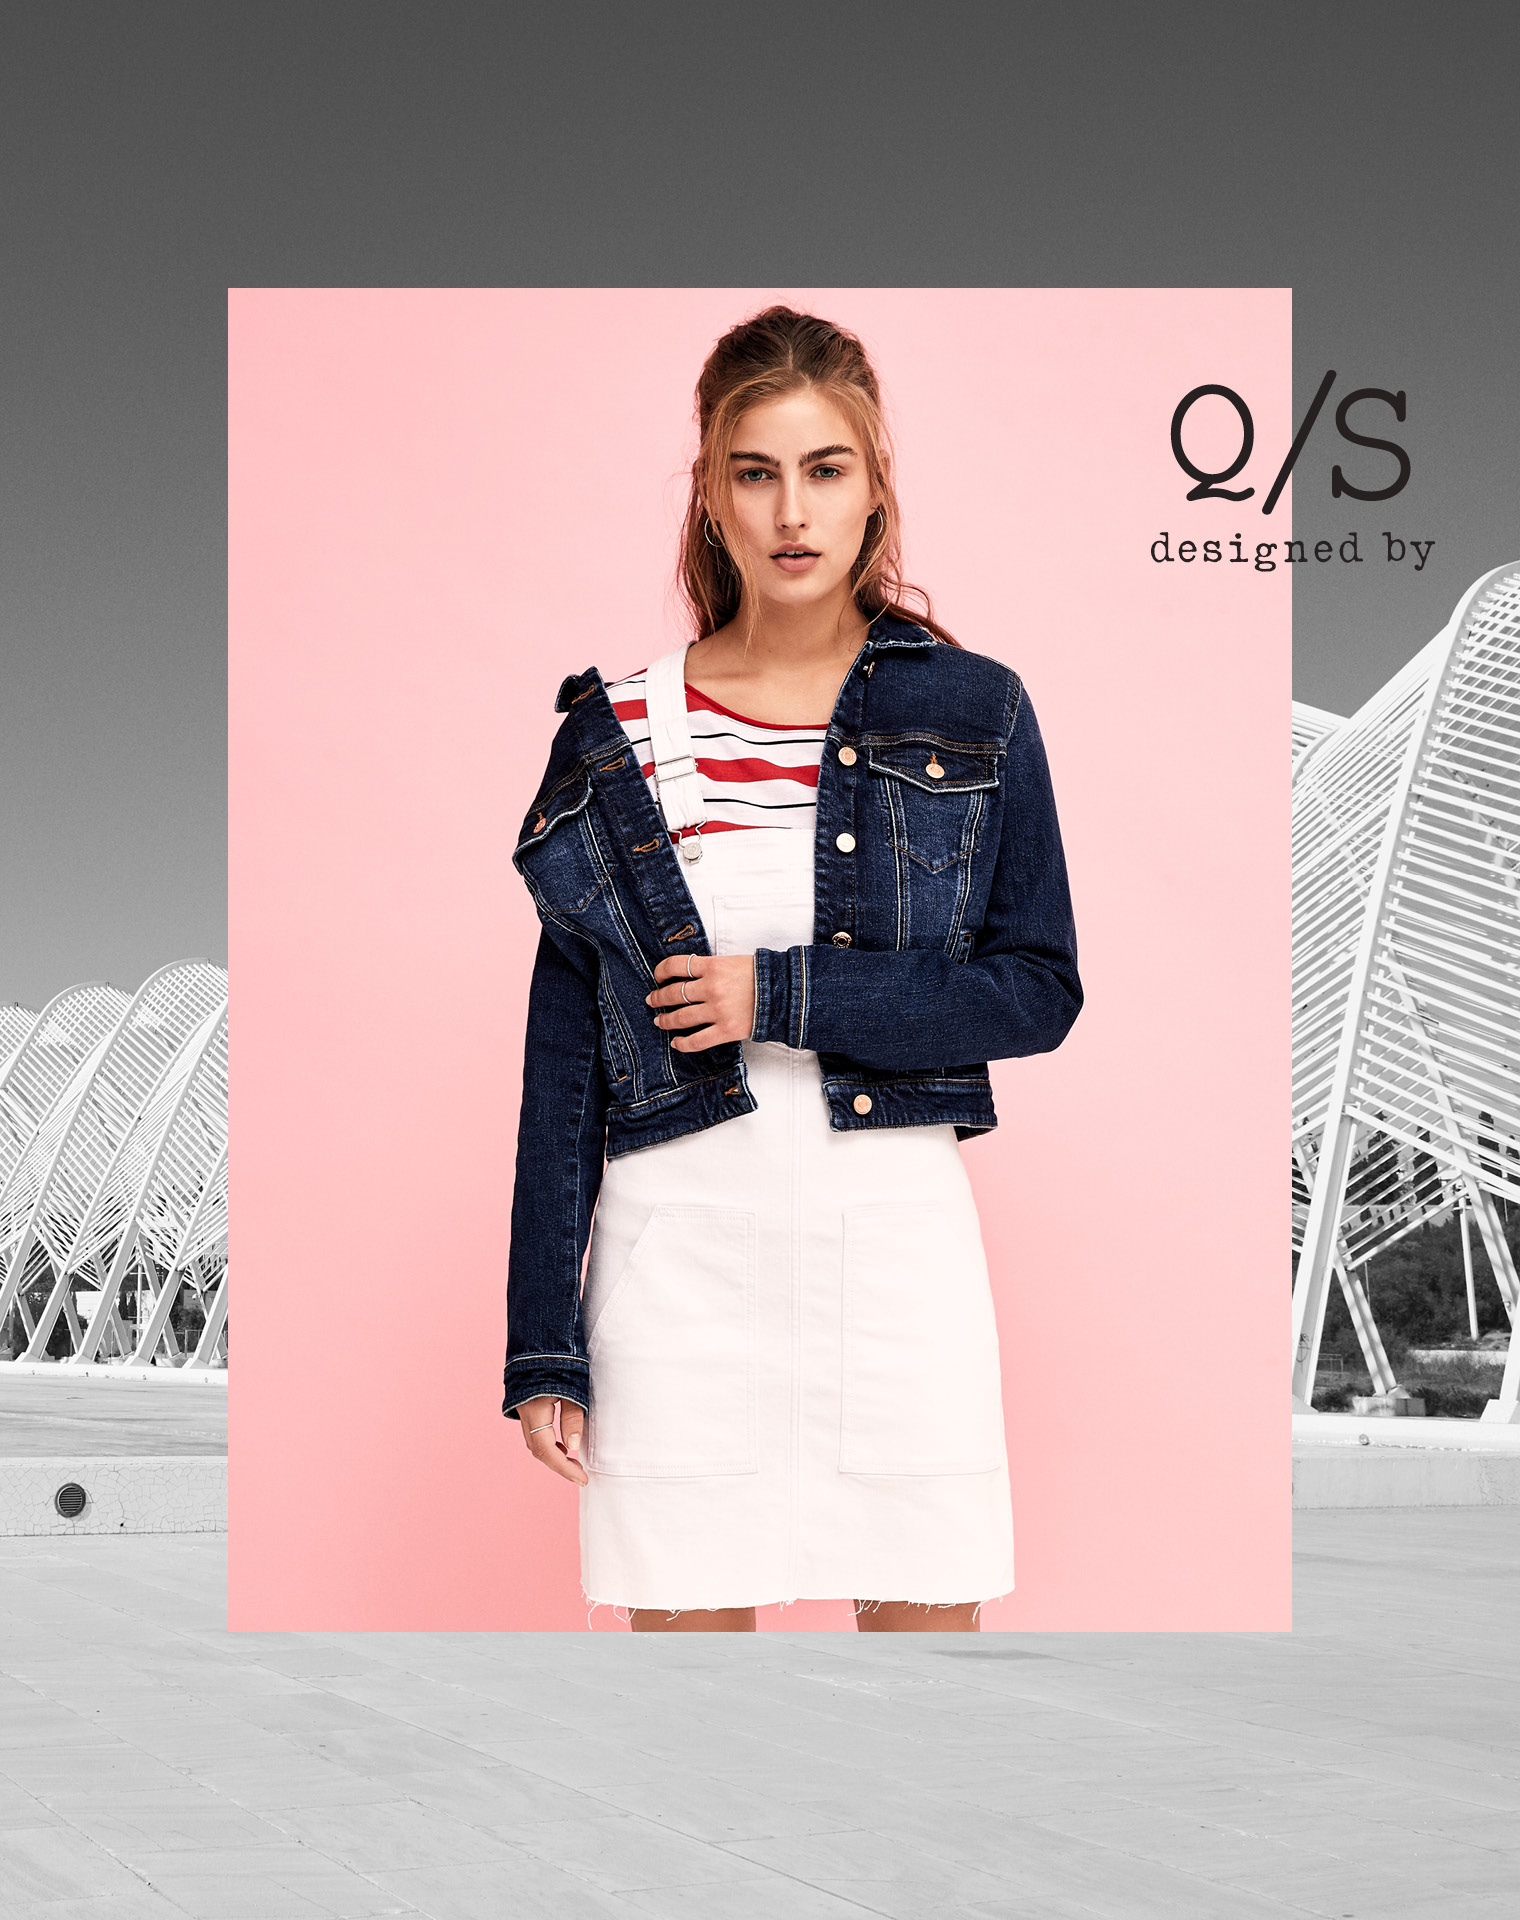 QS-designed_spring_summer_2020_original_Imageteaser_QS_SS2020_001-003_1520x1920px_500